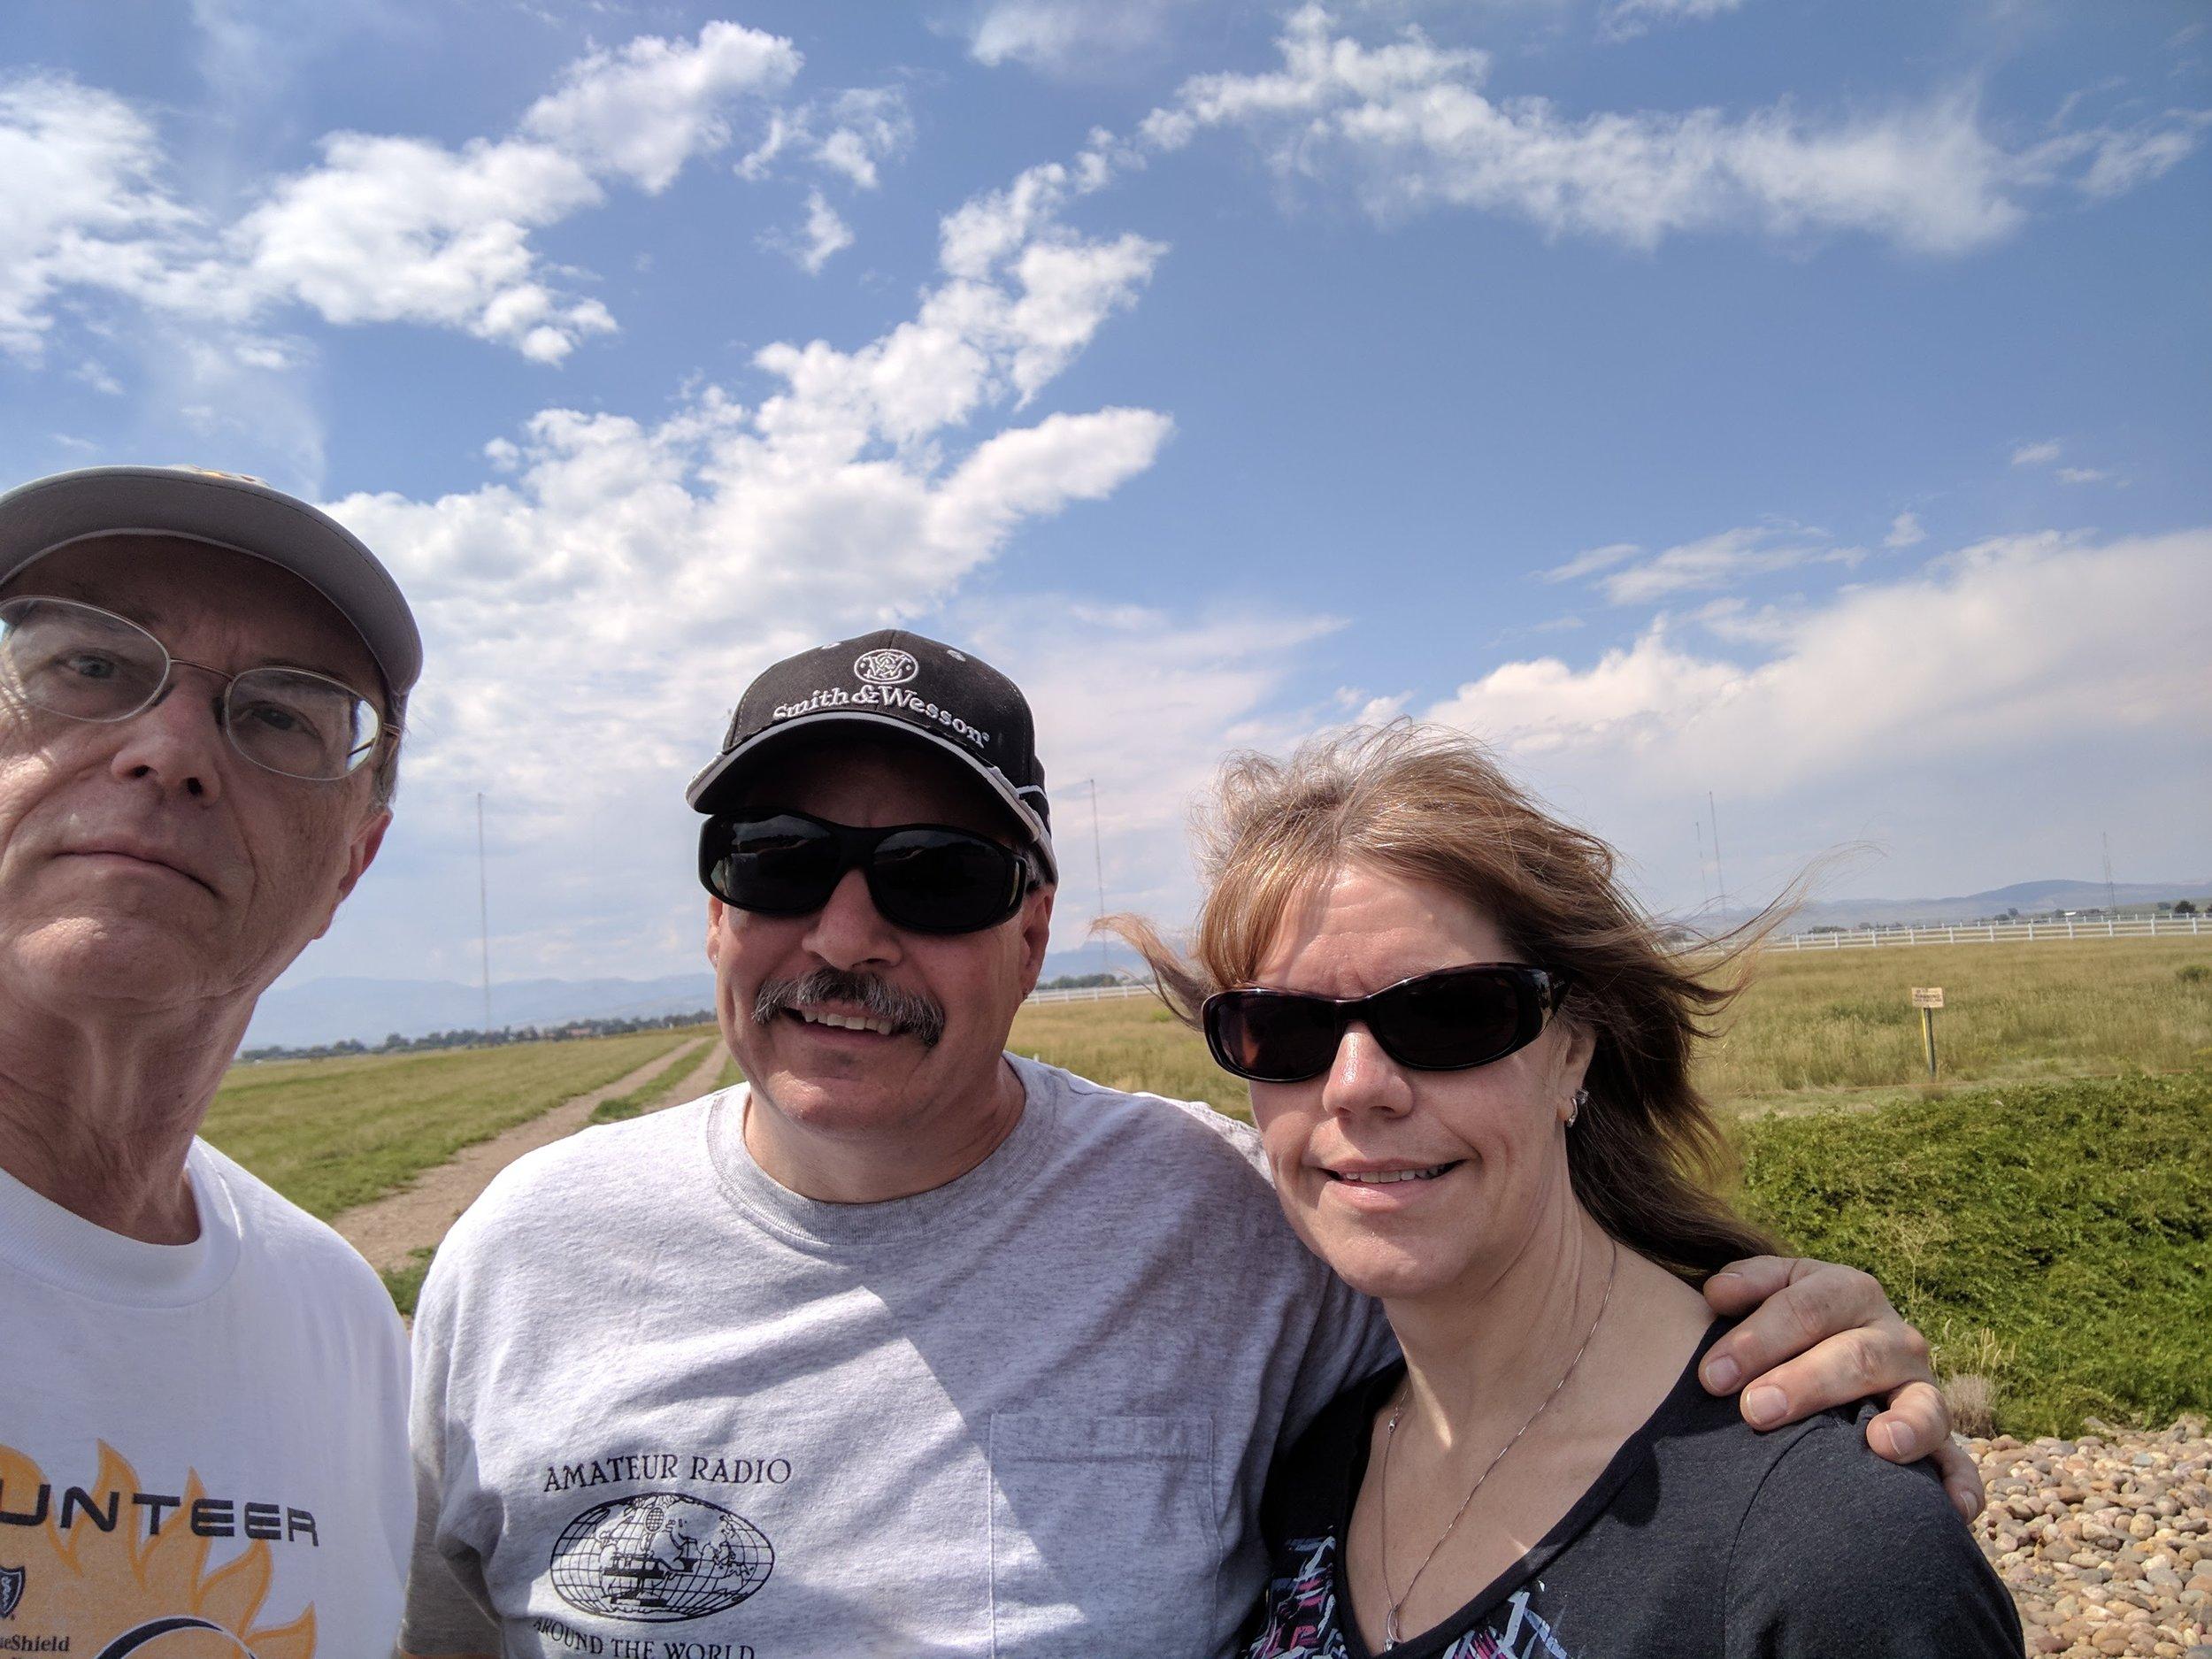 Gary, Jeff, Bobbie at WWV